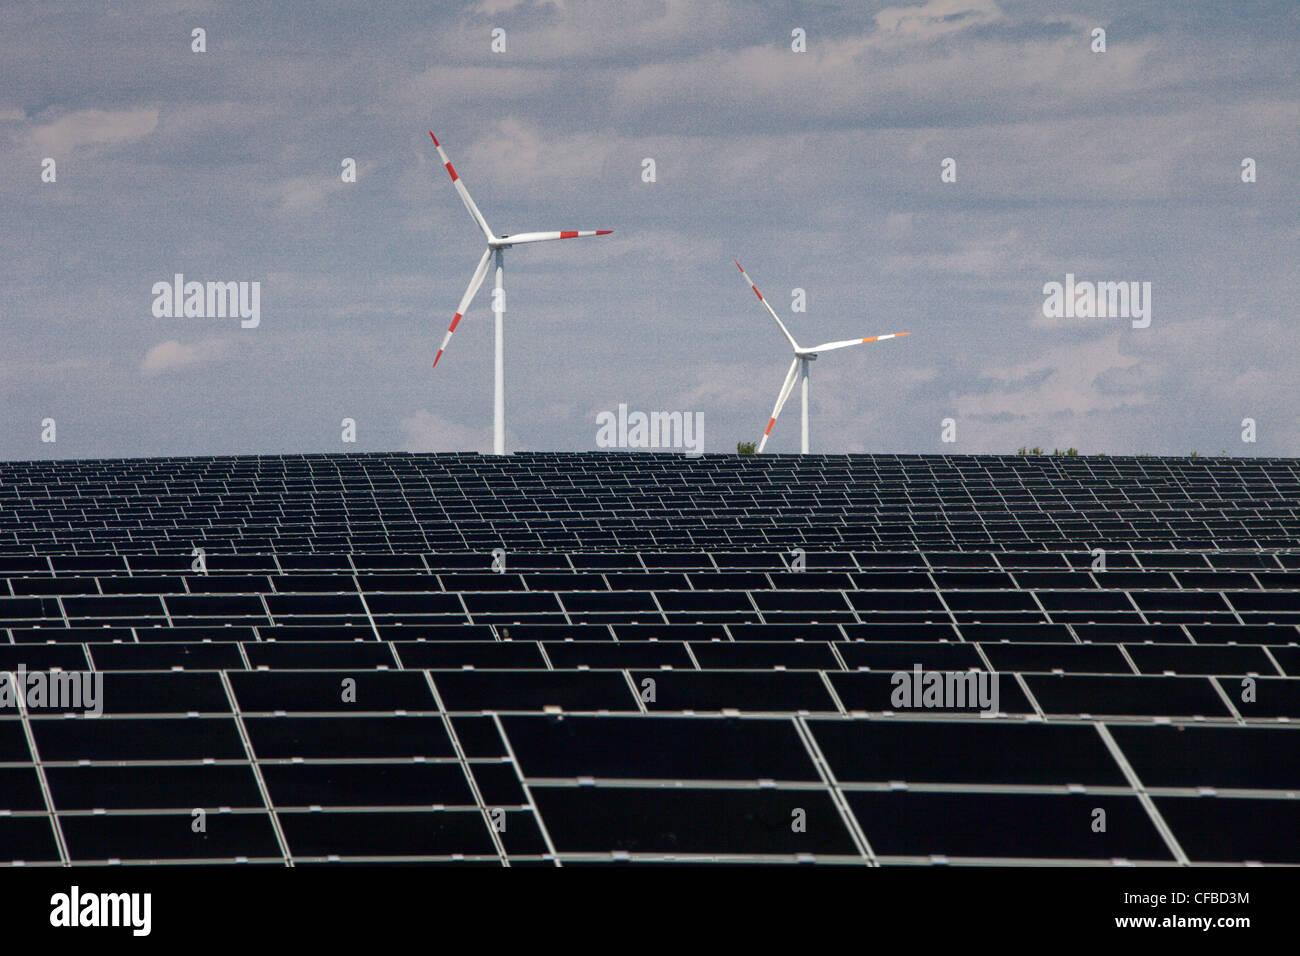 Deutschland, Energie, Solarenergie, Sonnenenergie, Windturbine, alternative Energien, Ökologie, Energie, Solar, Stockbild